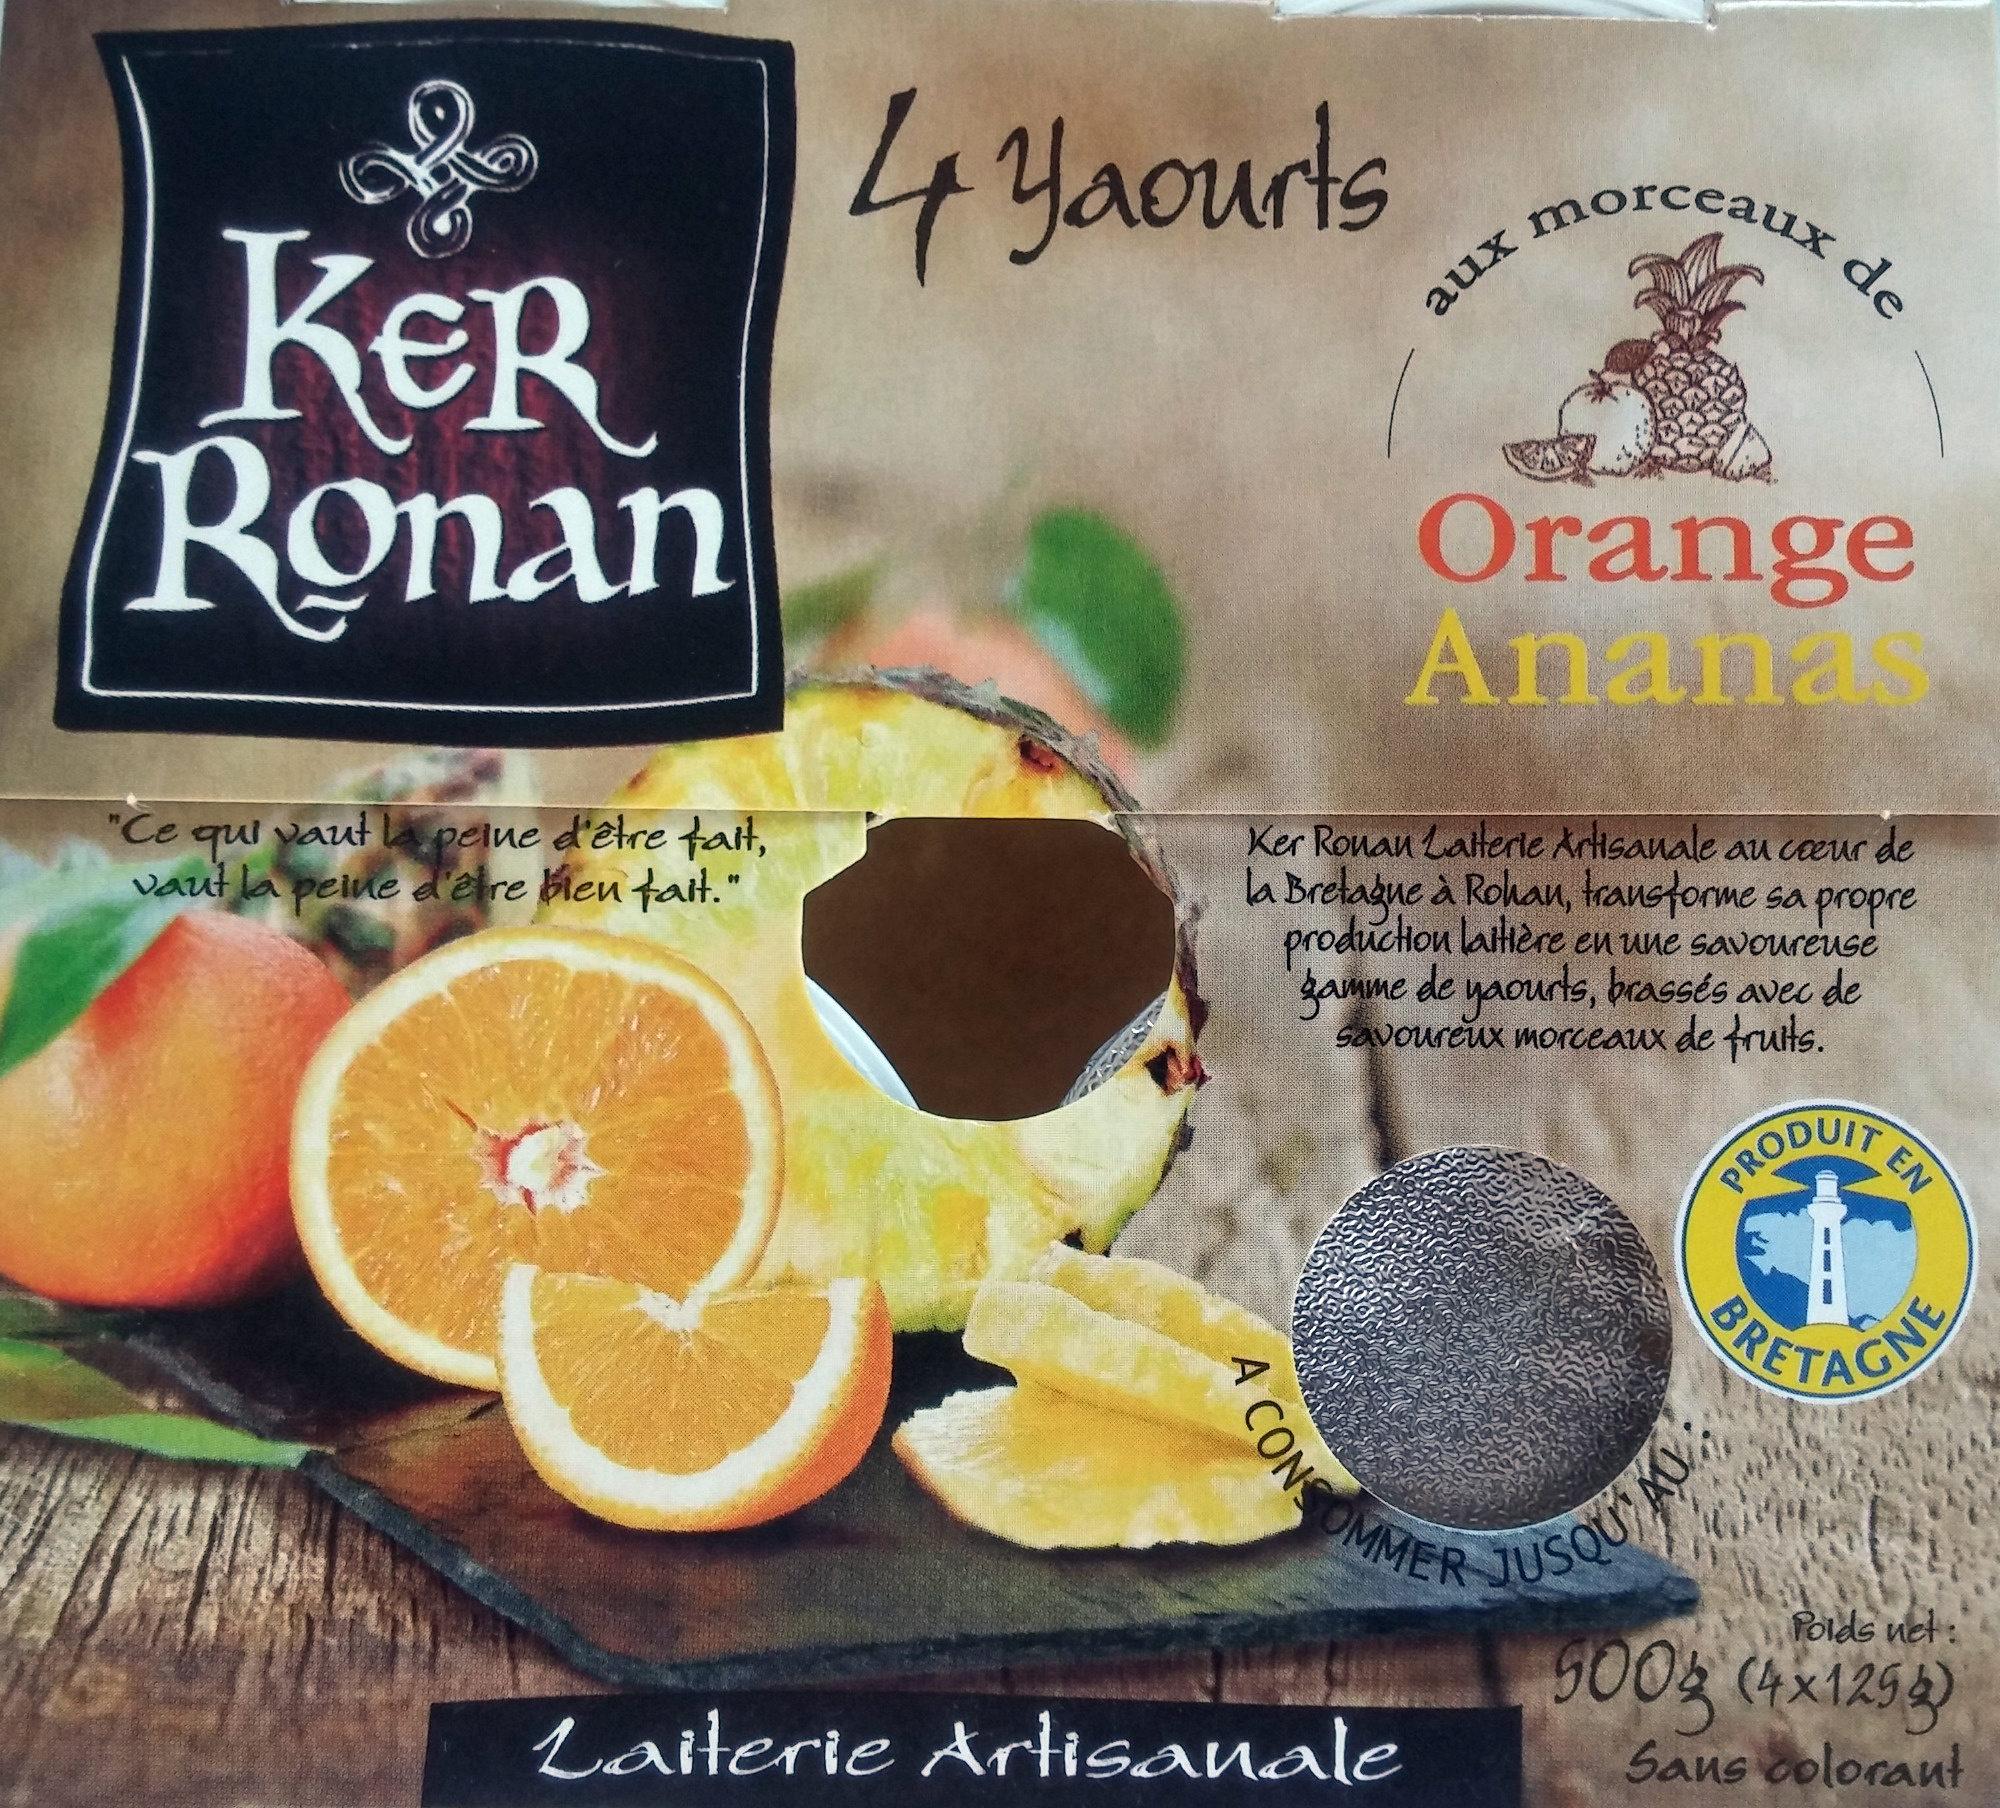 Yaourt Ker Ronan Orange/Ananas - Product - fr